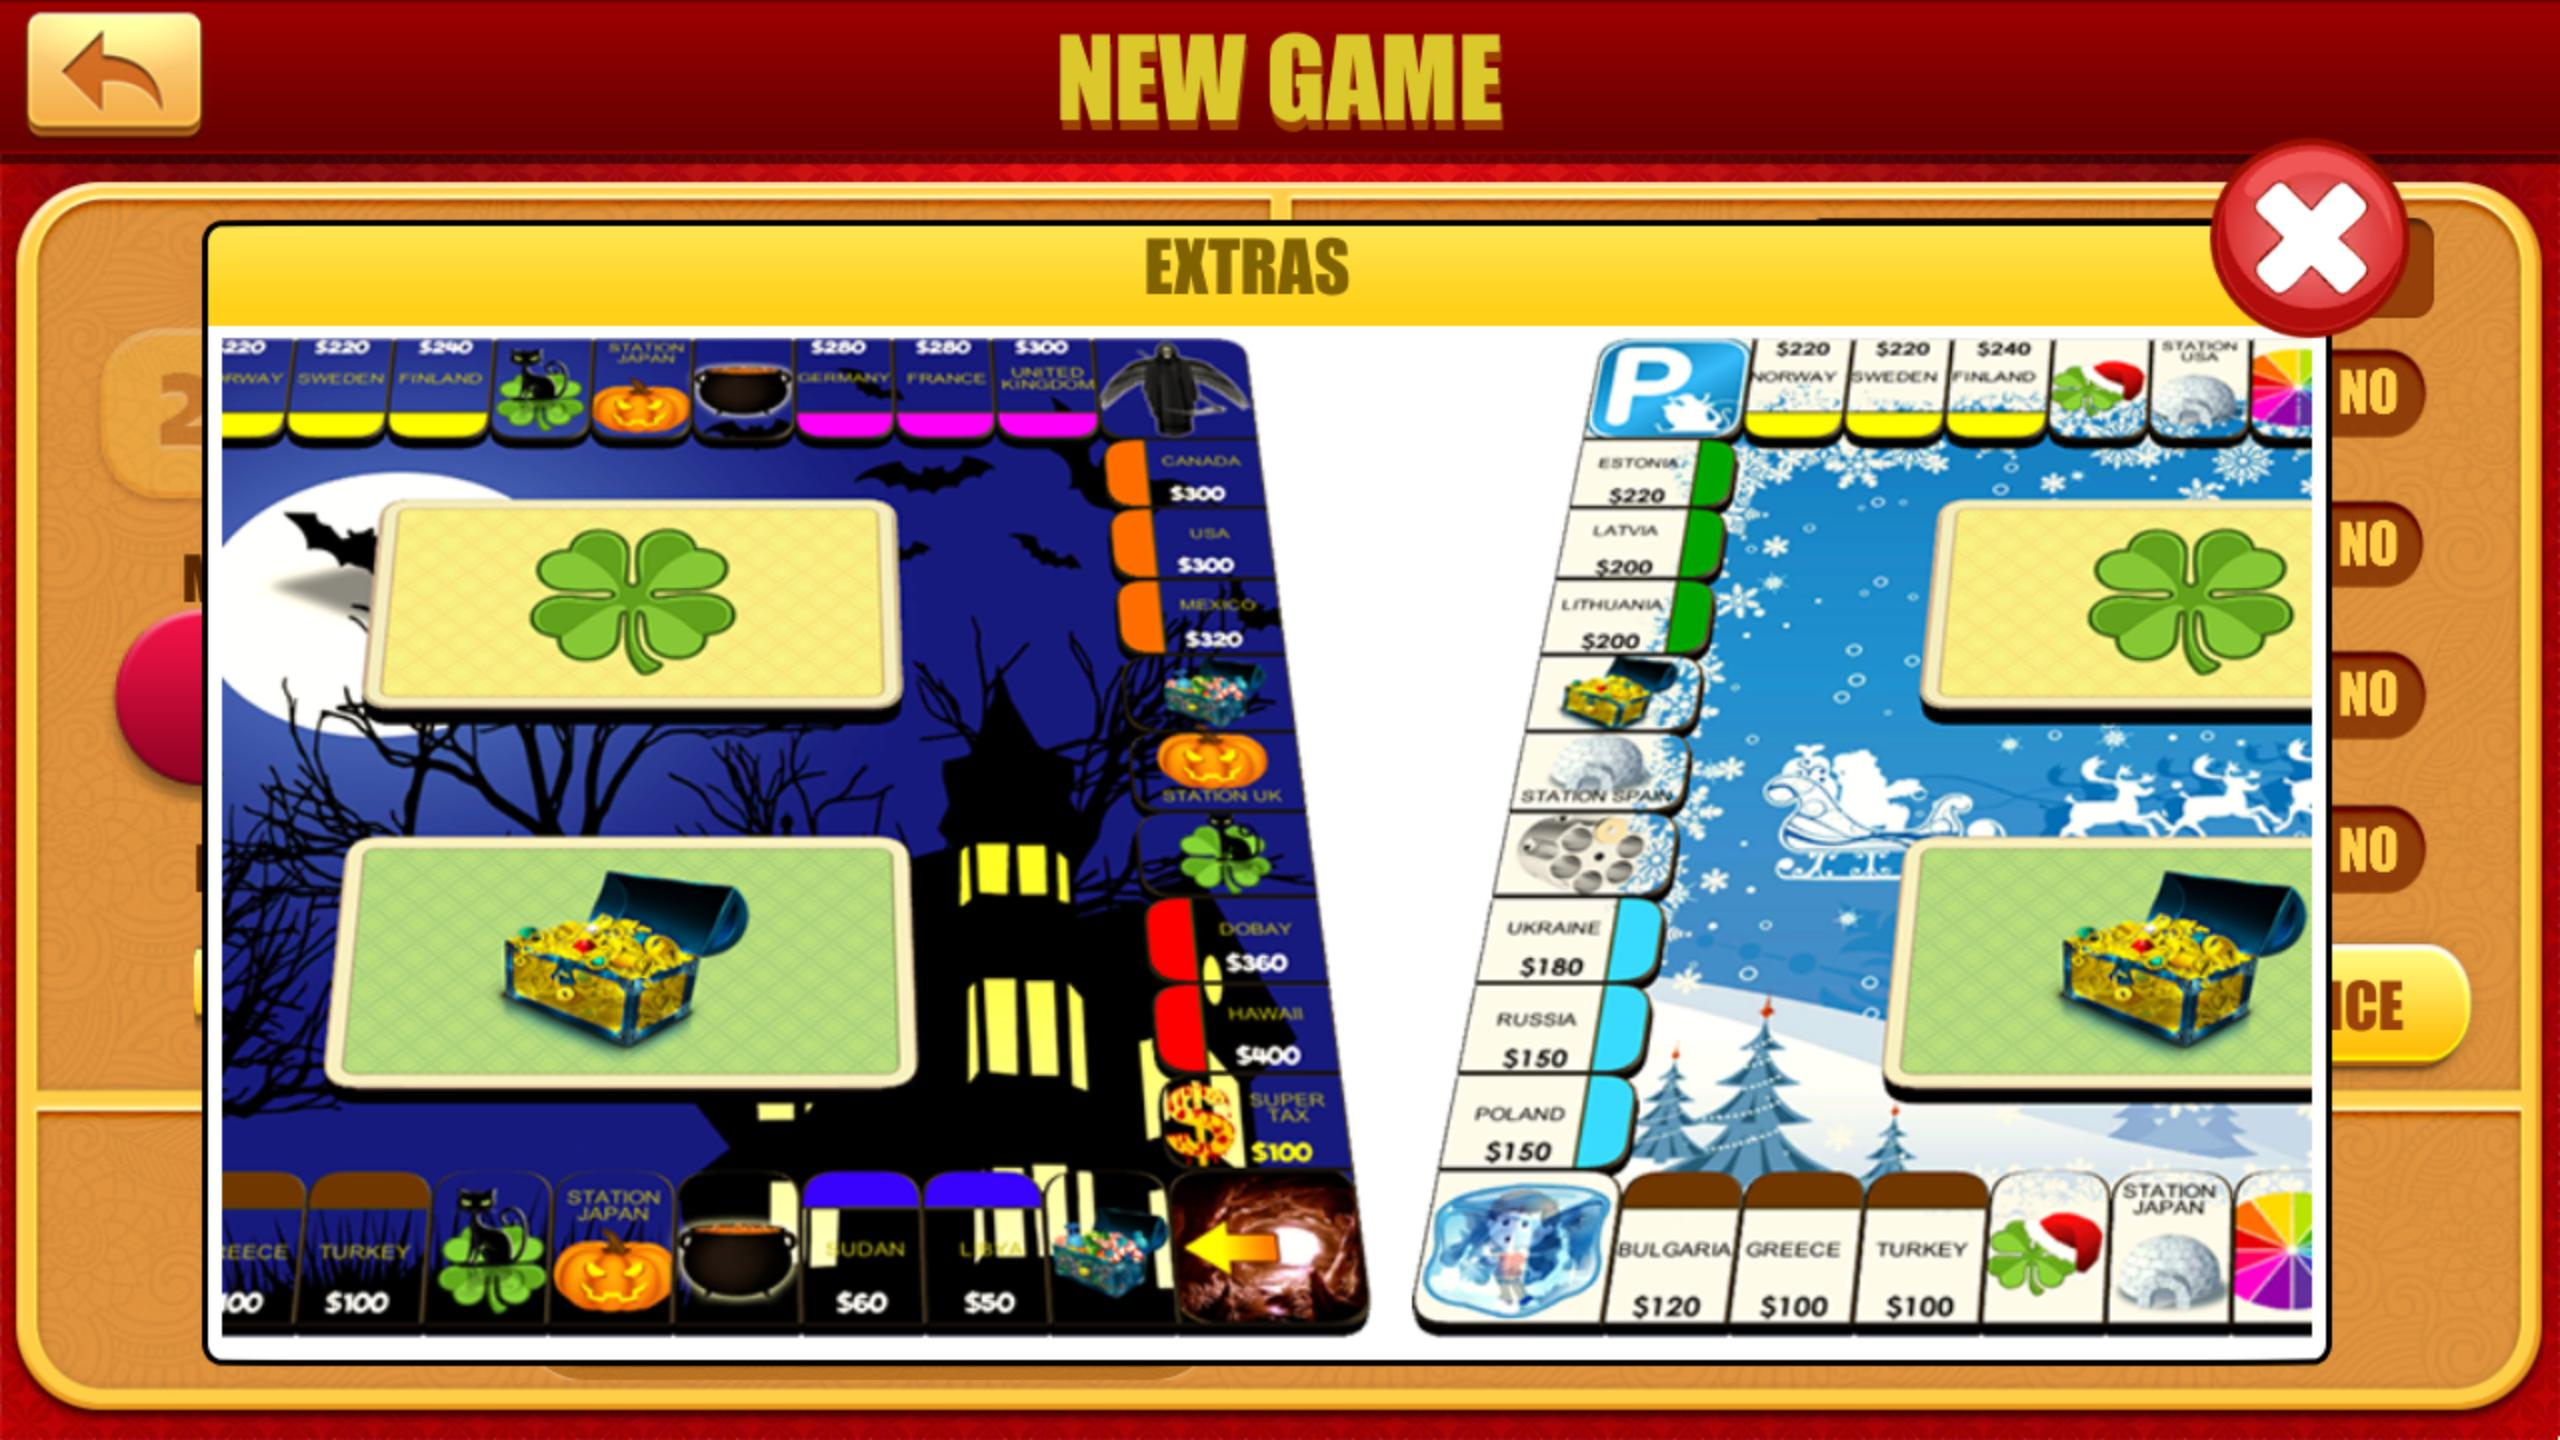 Rento Dice Board Game Online 5.1.9 Screenshot 8